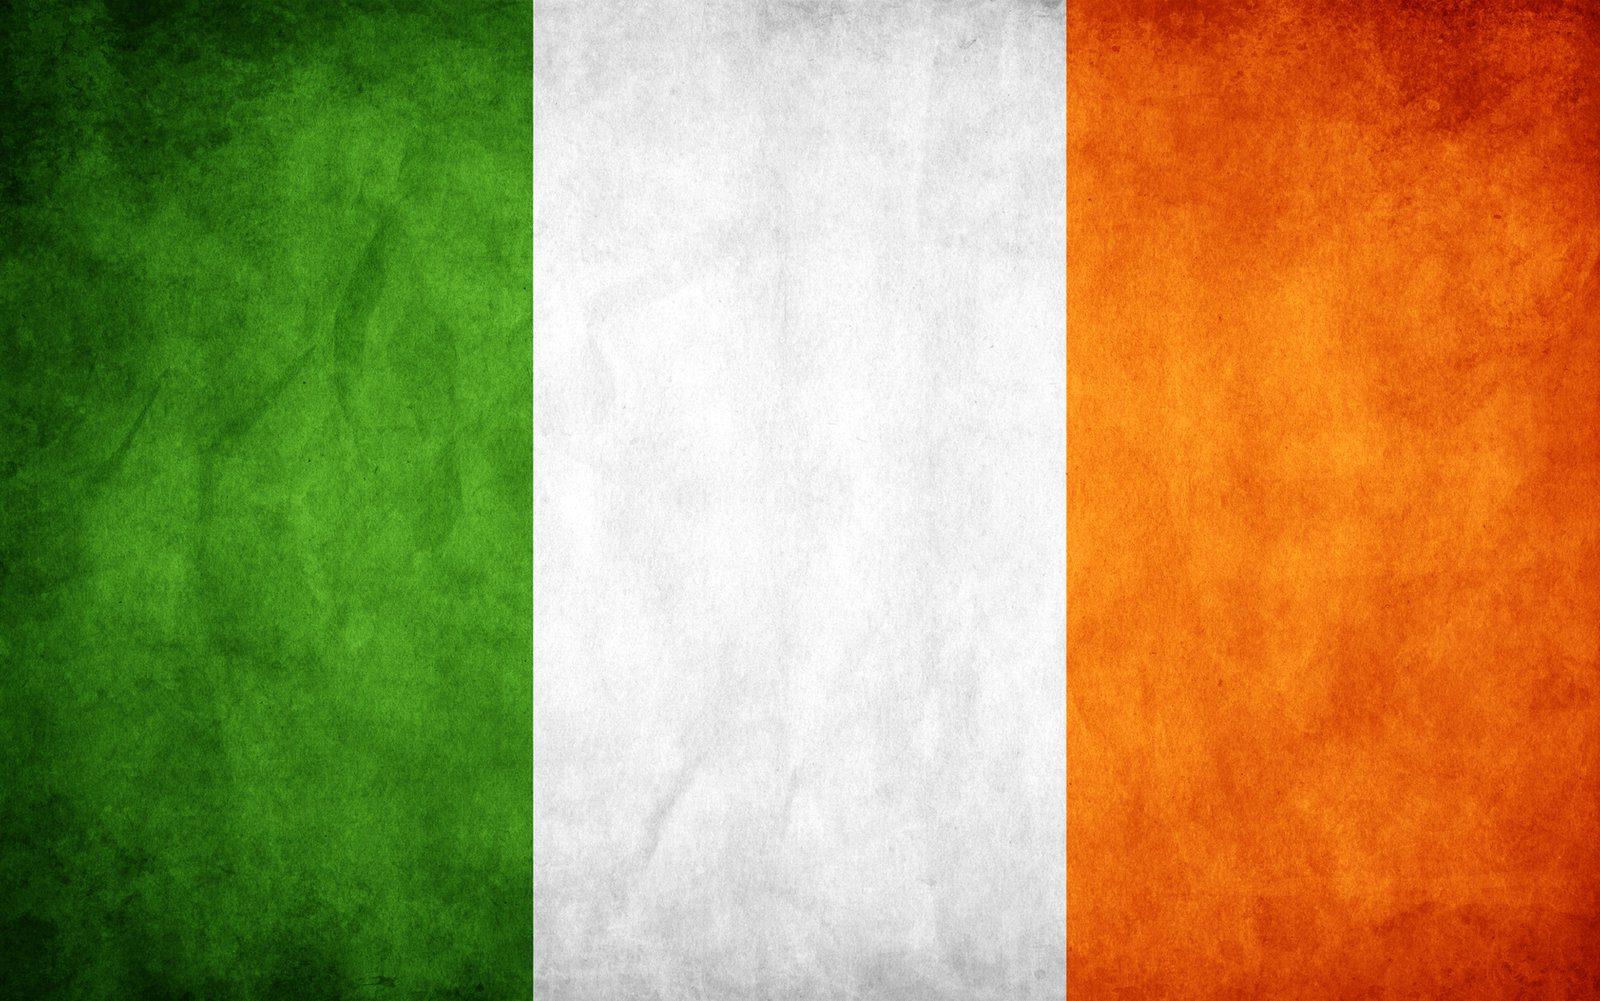 Bandeira da Irlanda: qual o significado das cores laranja, branca e verde